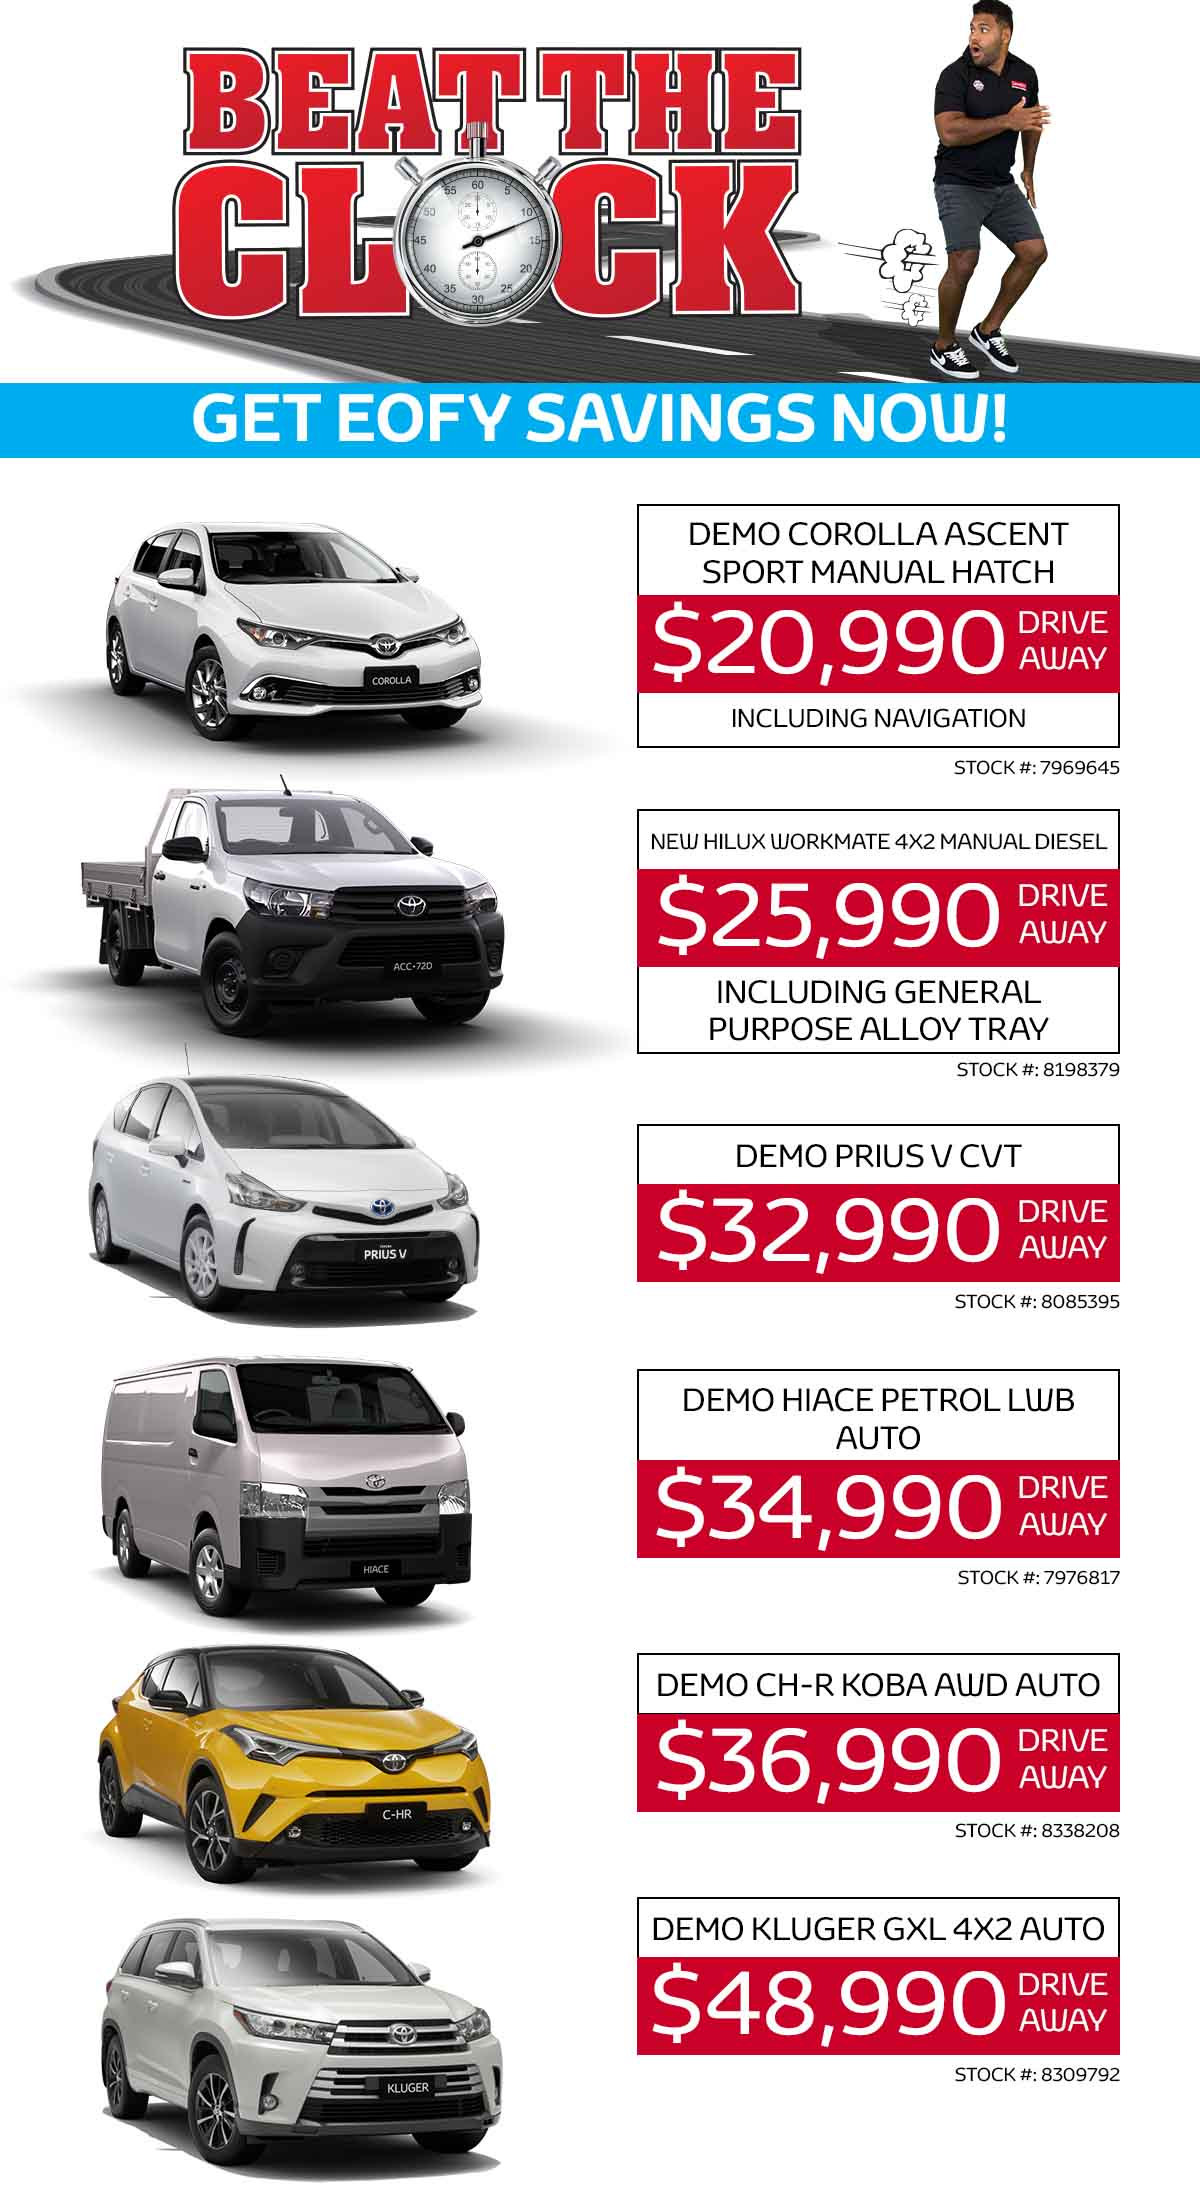 Toyota-Beat the clock-EOFY Savings